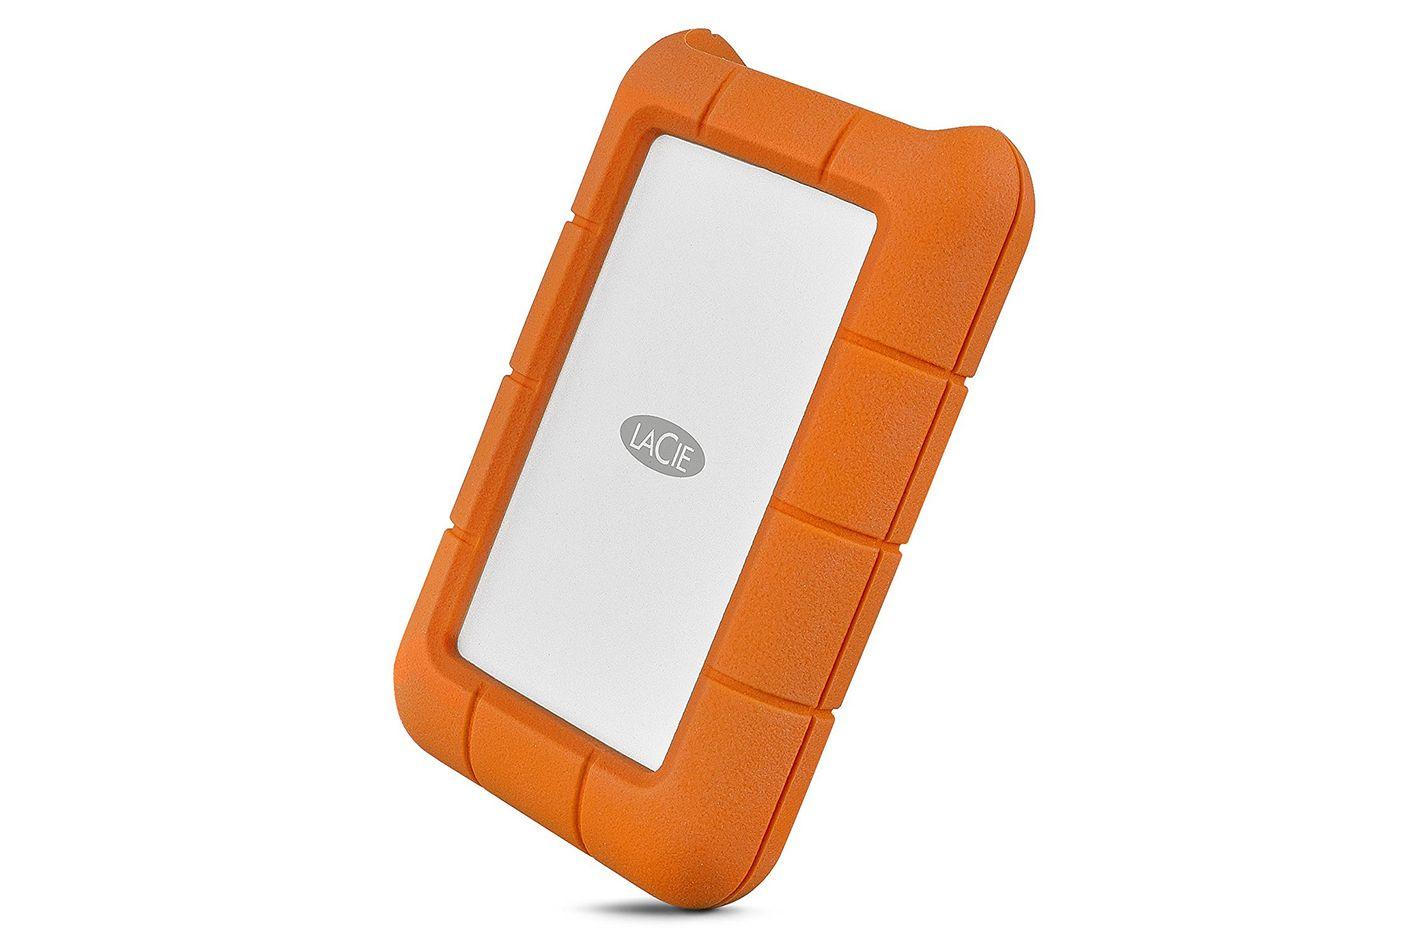 lacie 4-terabyte external hard drive